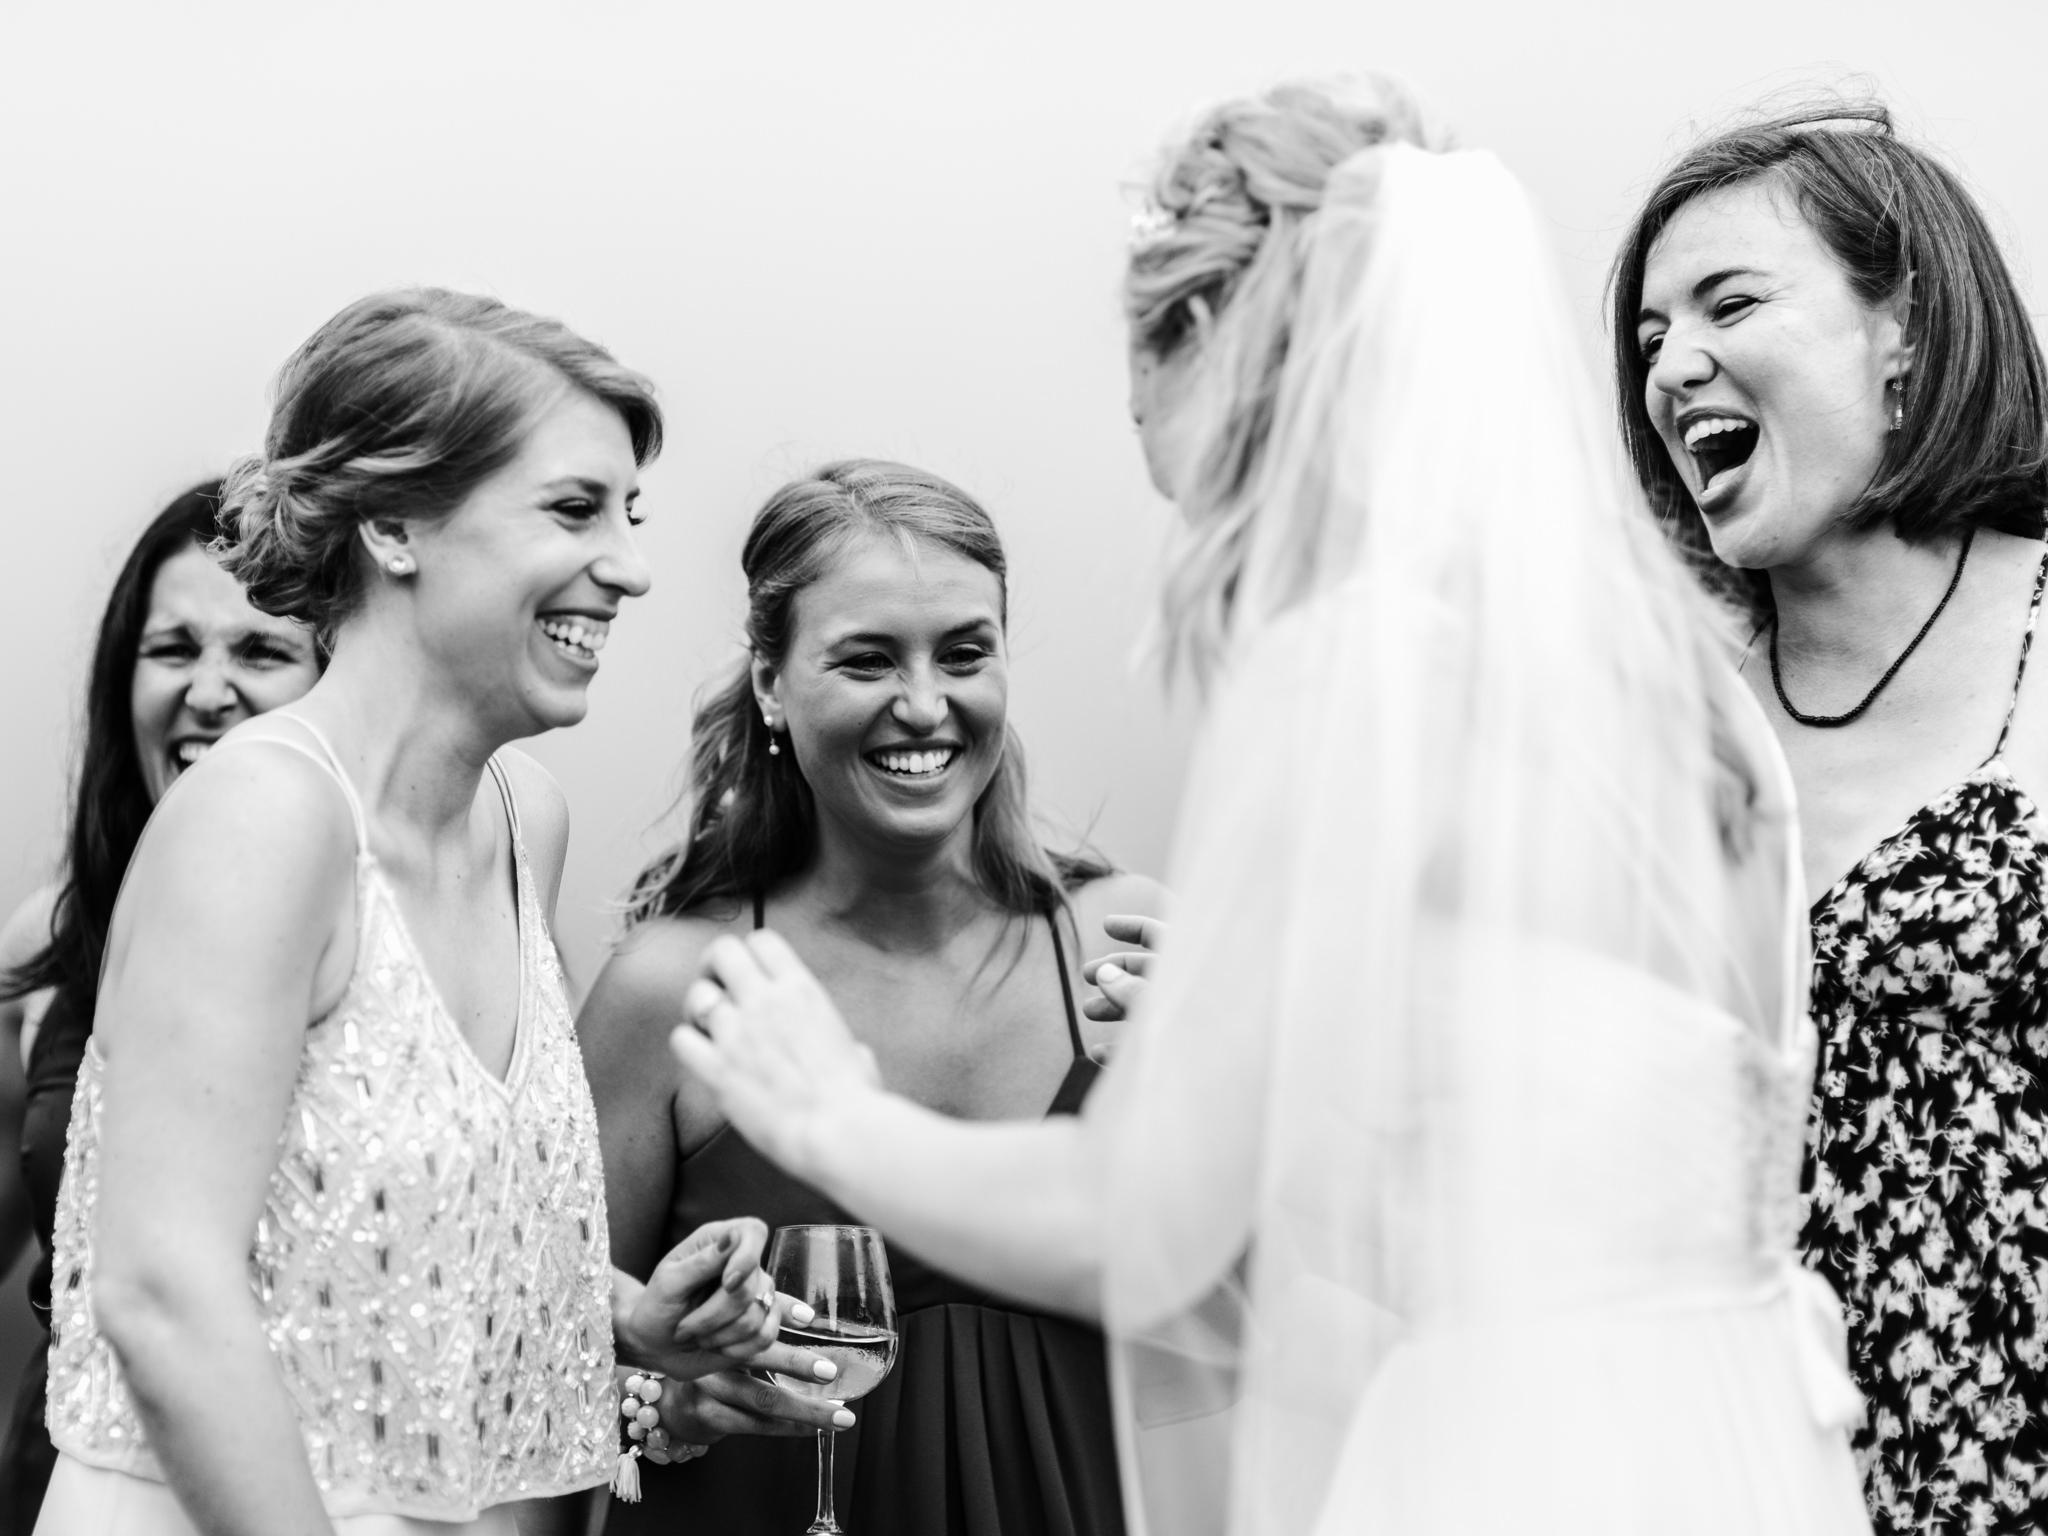 skyloft-wedding-photographer-4.jpg